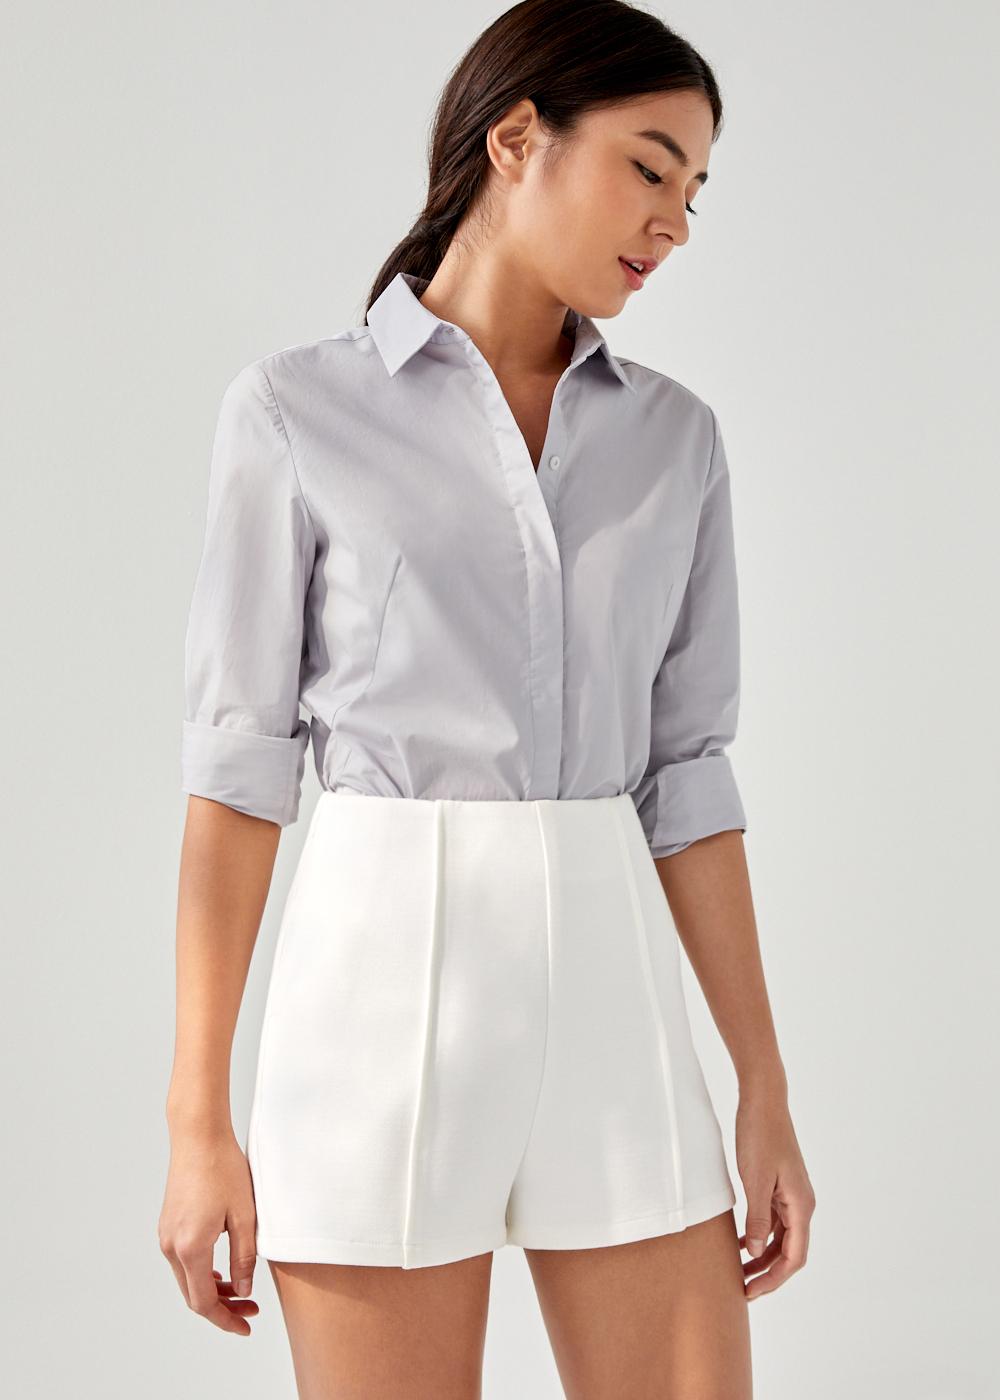 Ari Classic Button Down Shirt